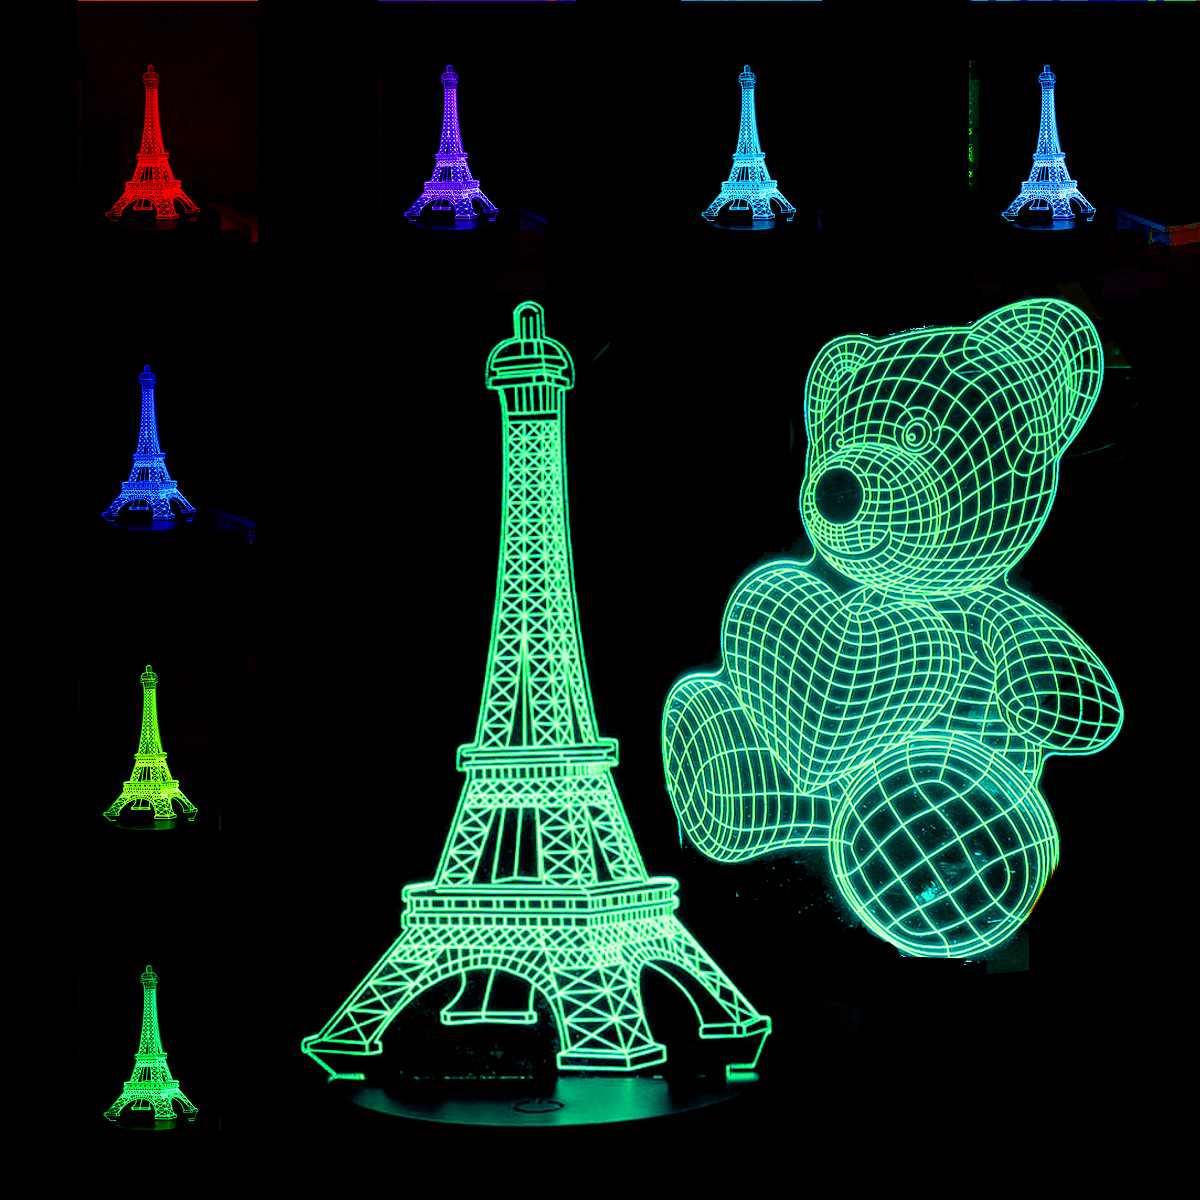 Baby Teddy Bear/Eiffel Tower 3D LED Night Light  Acrylic Board Plate Home Room Decor Kids Toy Christmas Gift